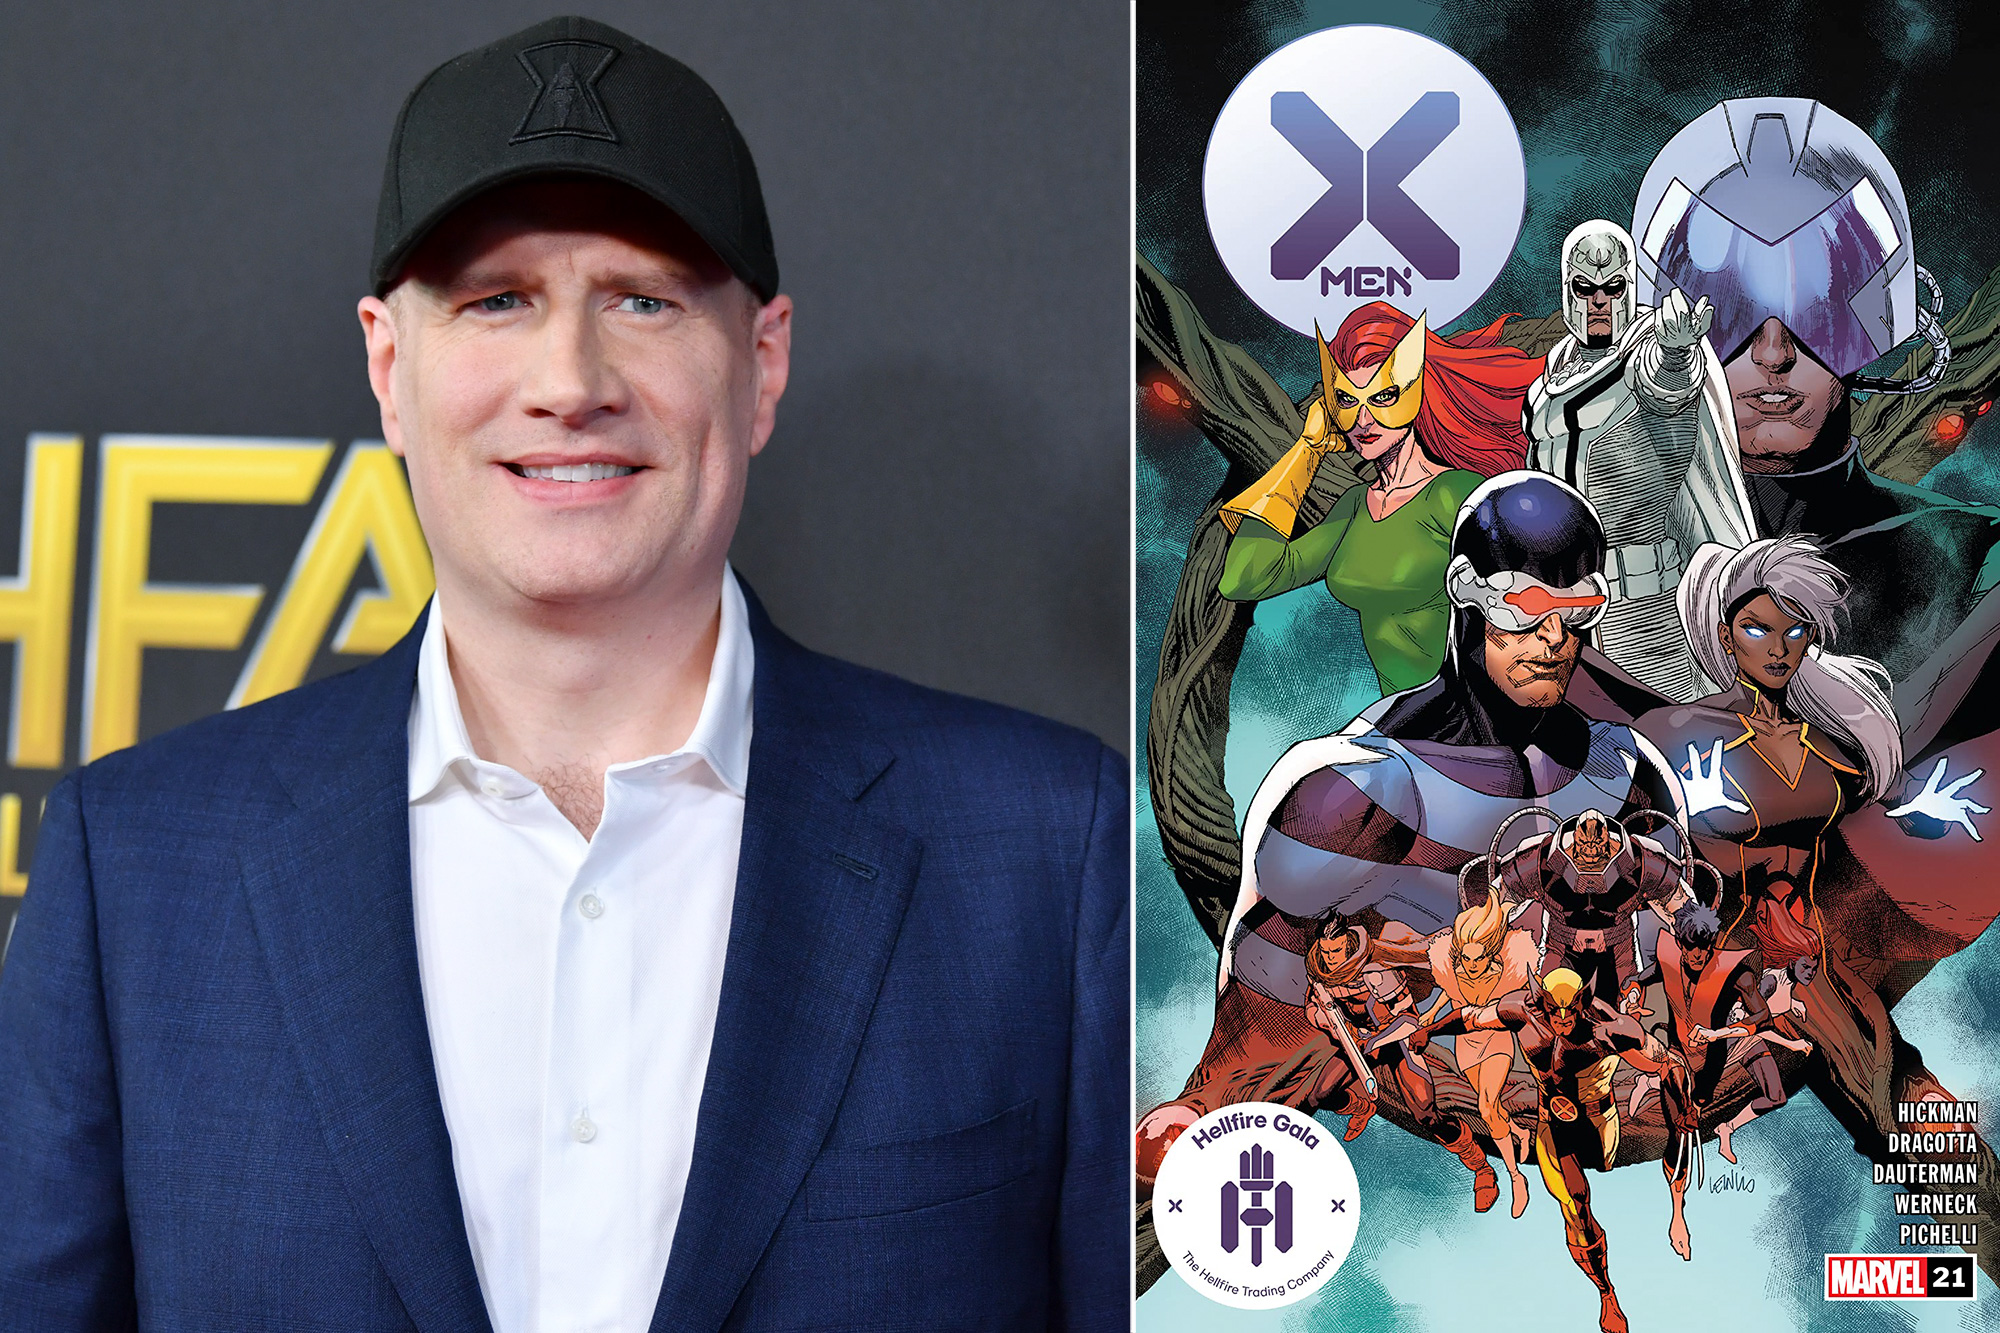 Kevin Feige, X-Men